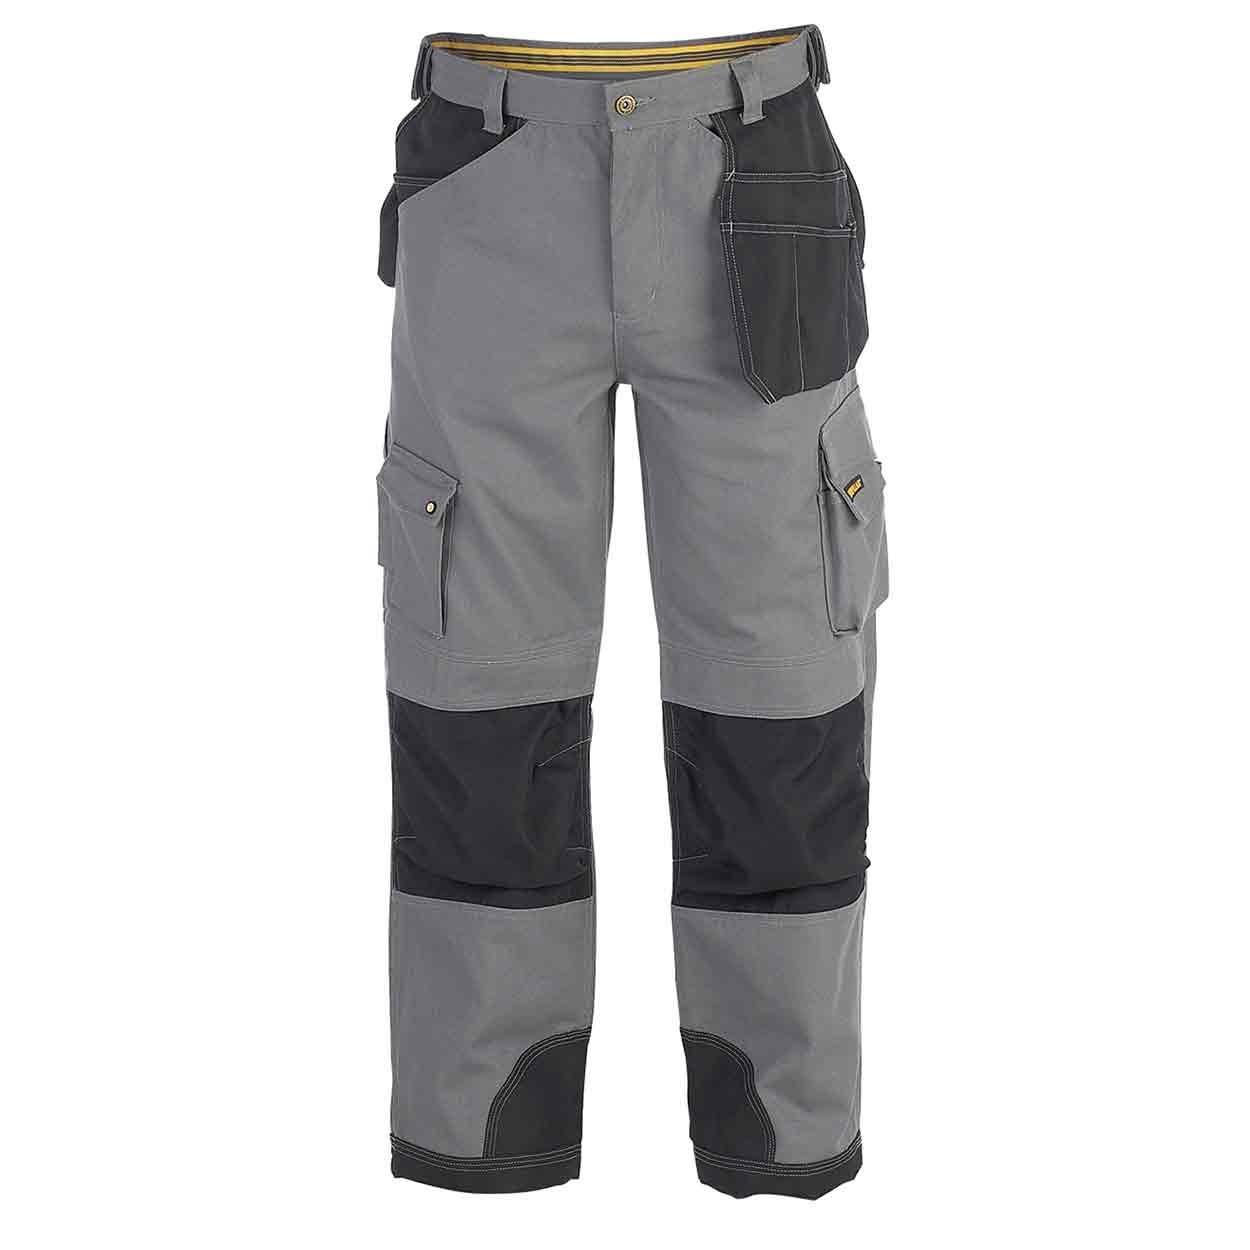 CAT C172 Trademark Knee Pad Work Trousers - Work Trousers - Workwear ... 1fcbf385a8